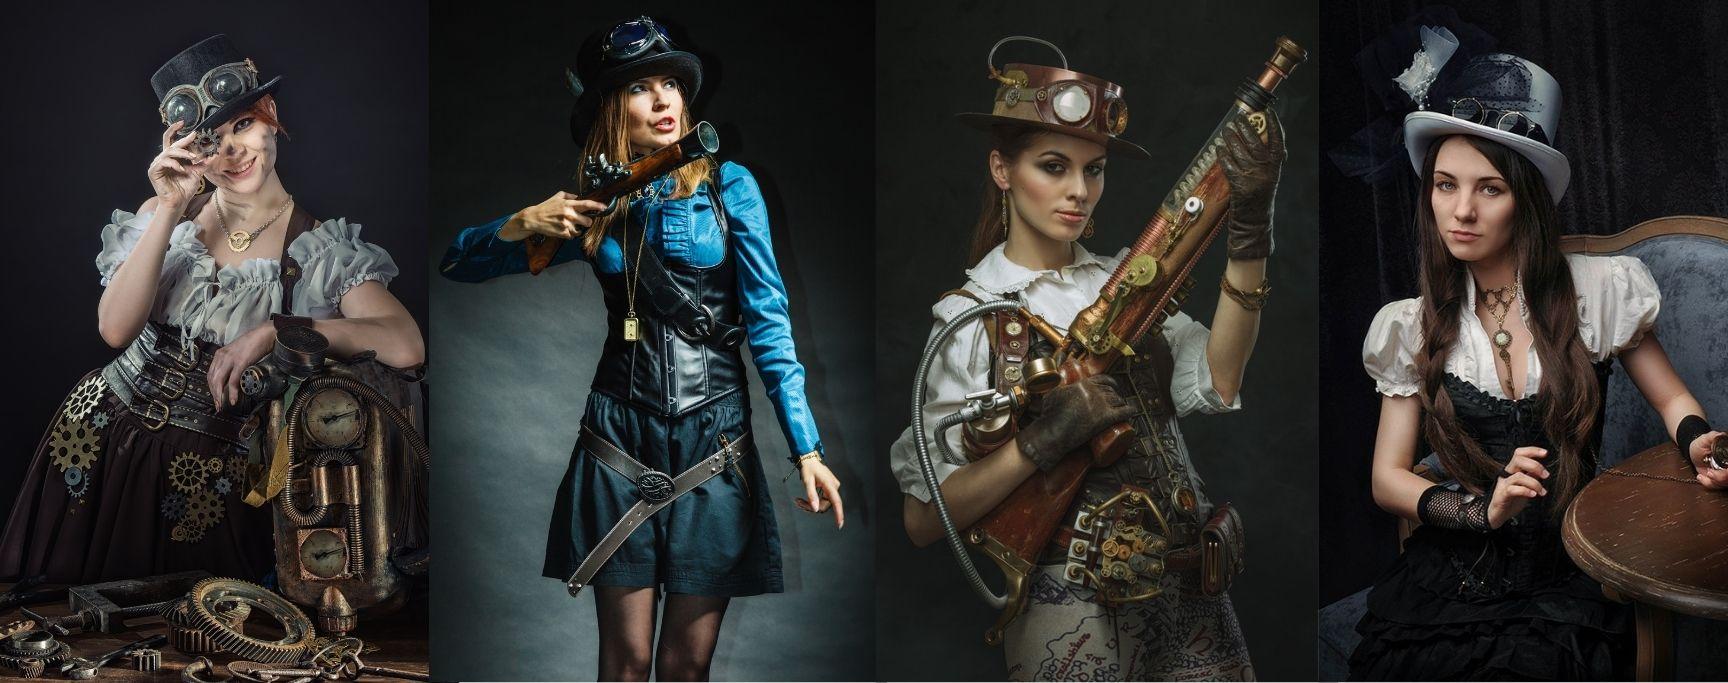 accessoire steampunk femme